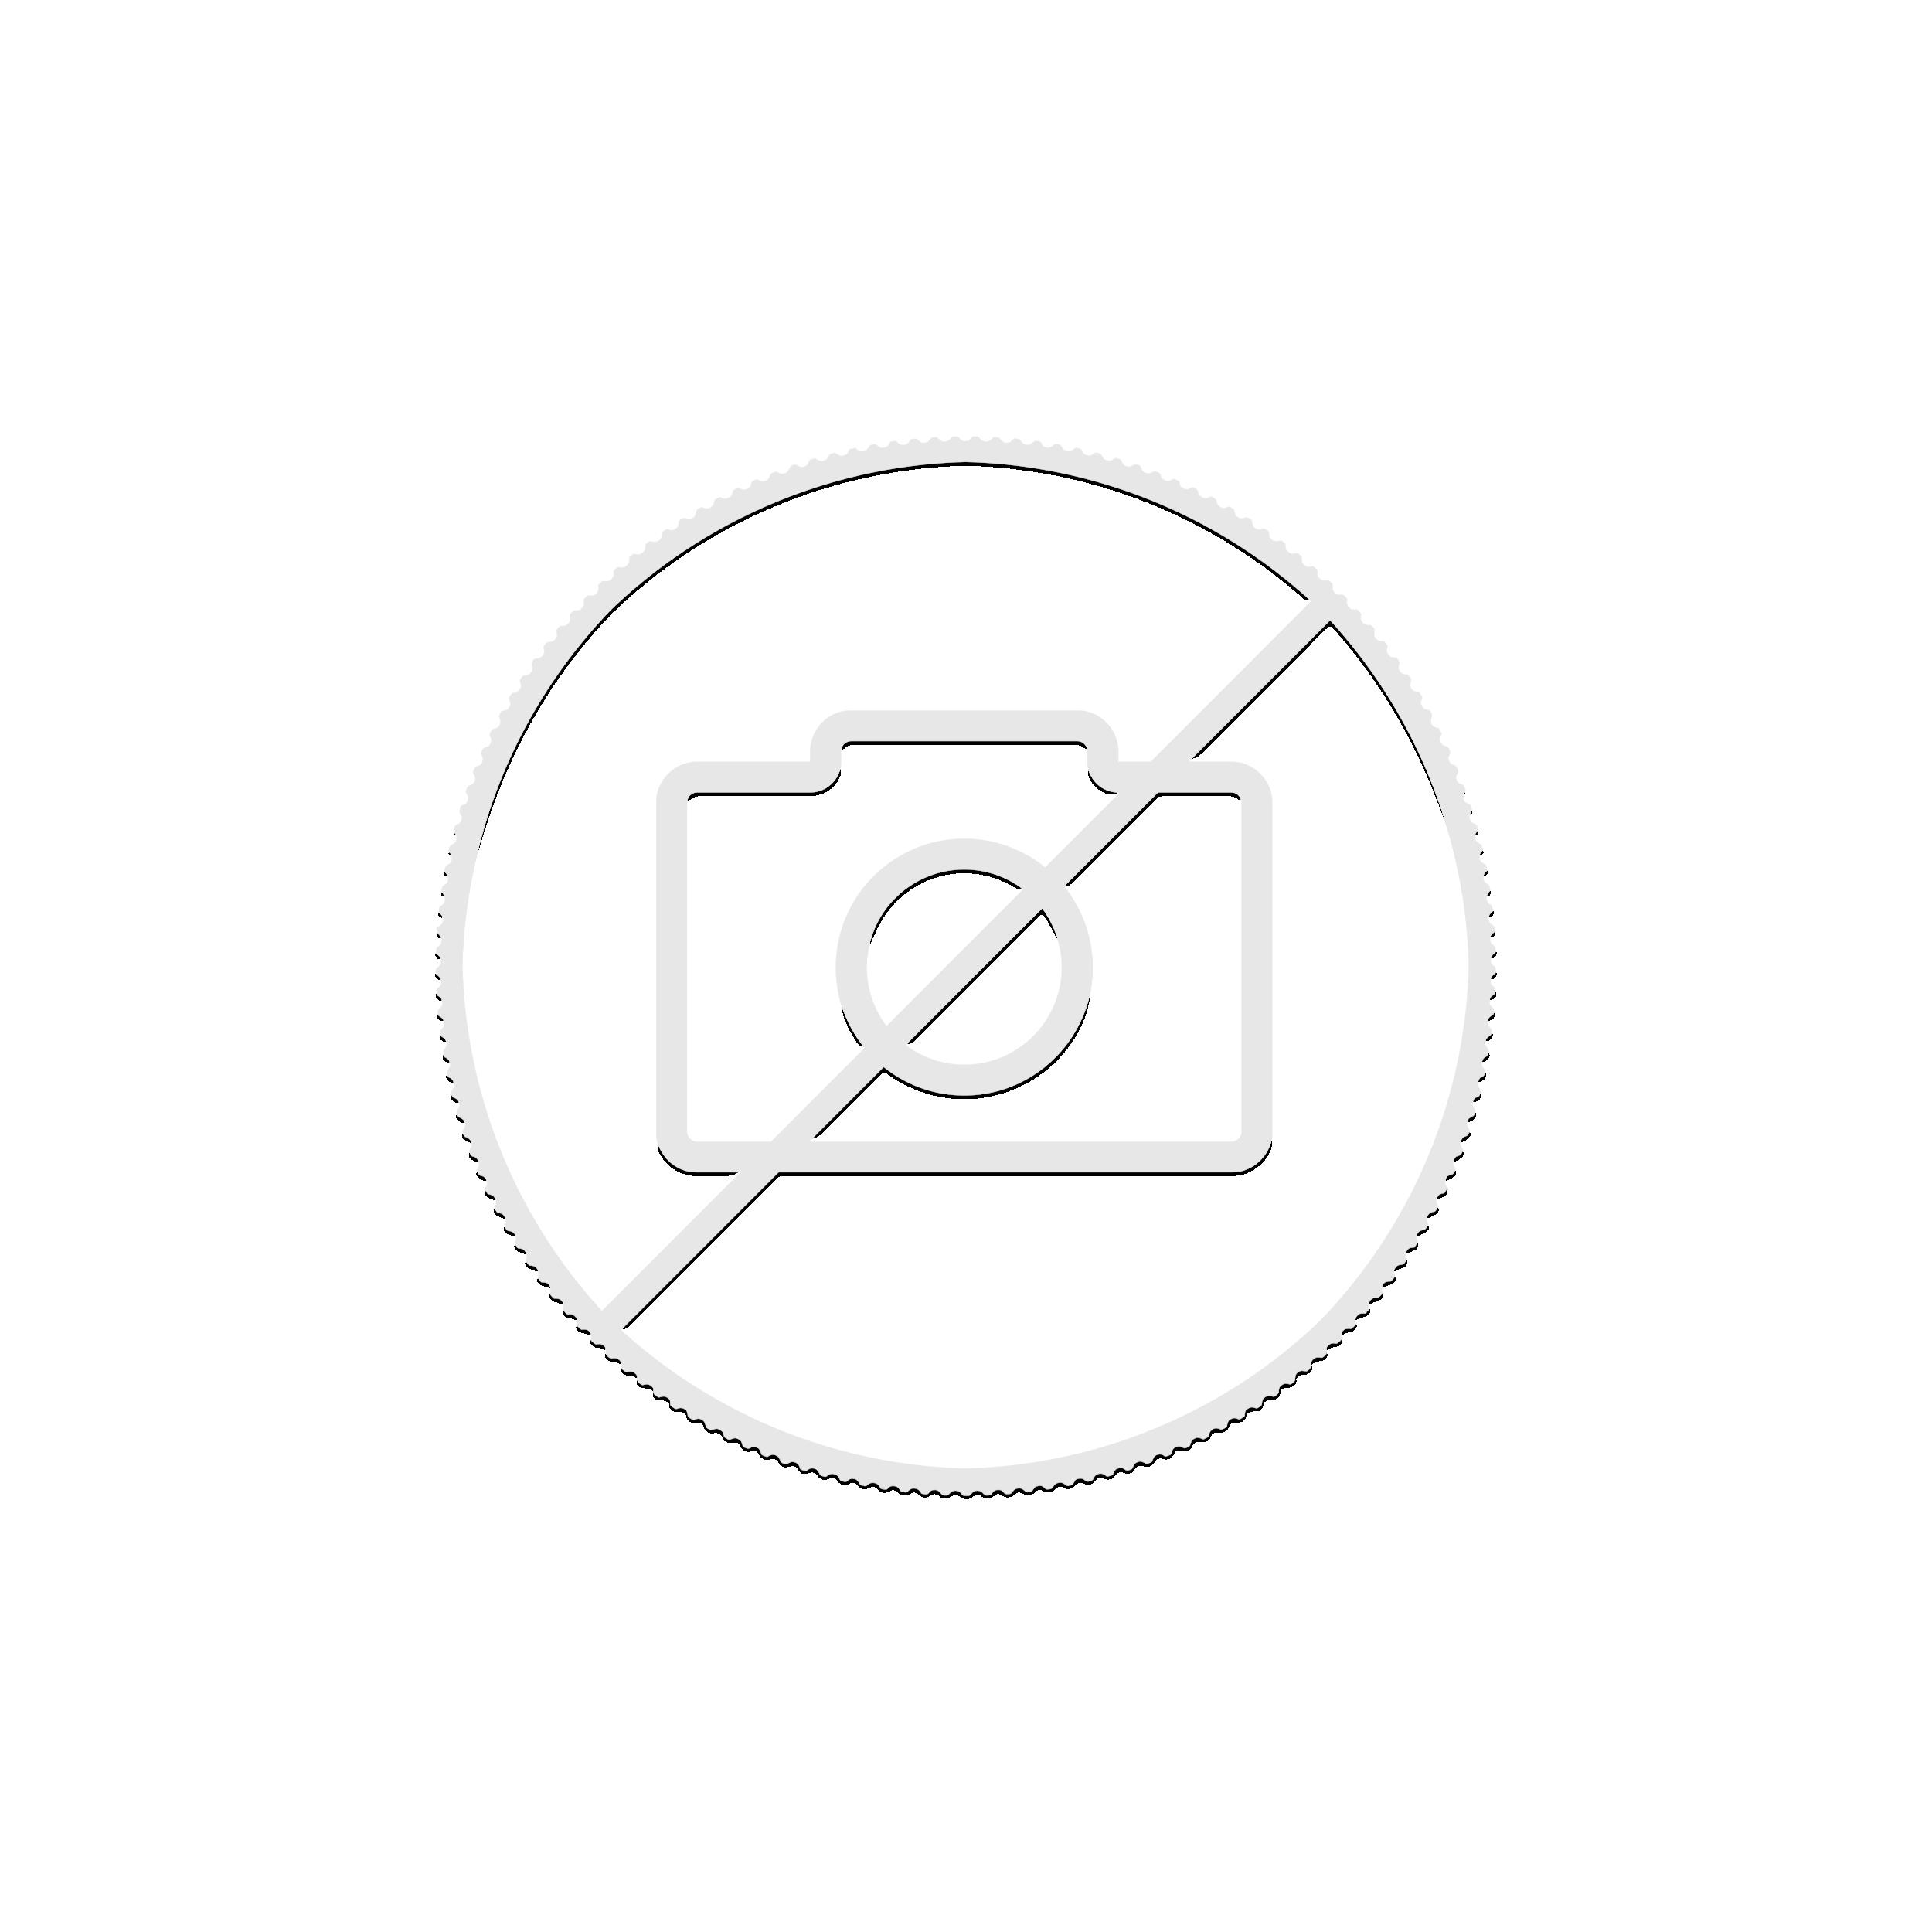 1 troy ounce platinum Cook Islands munt 2017